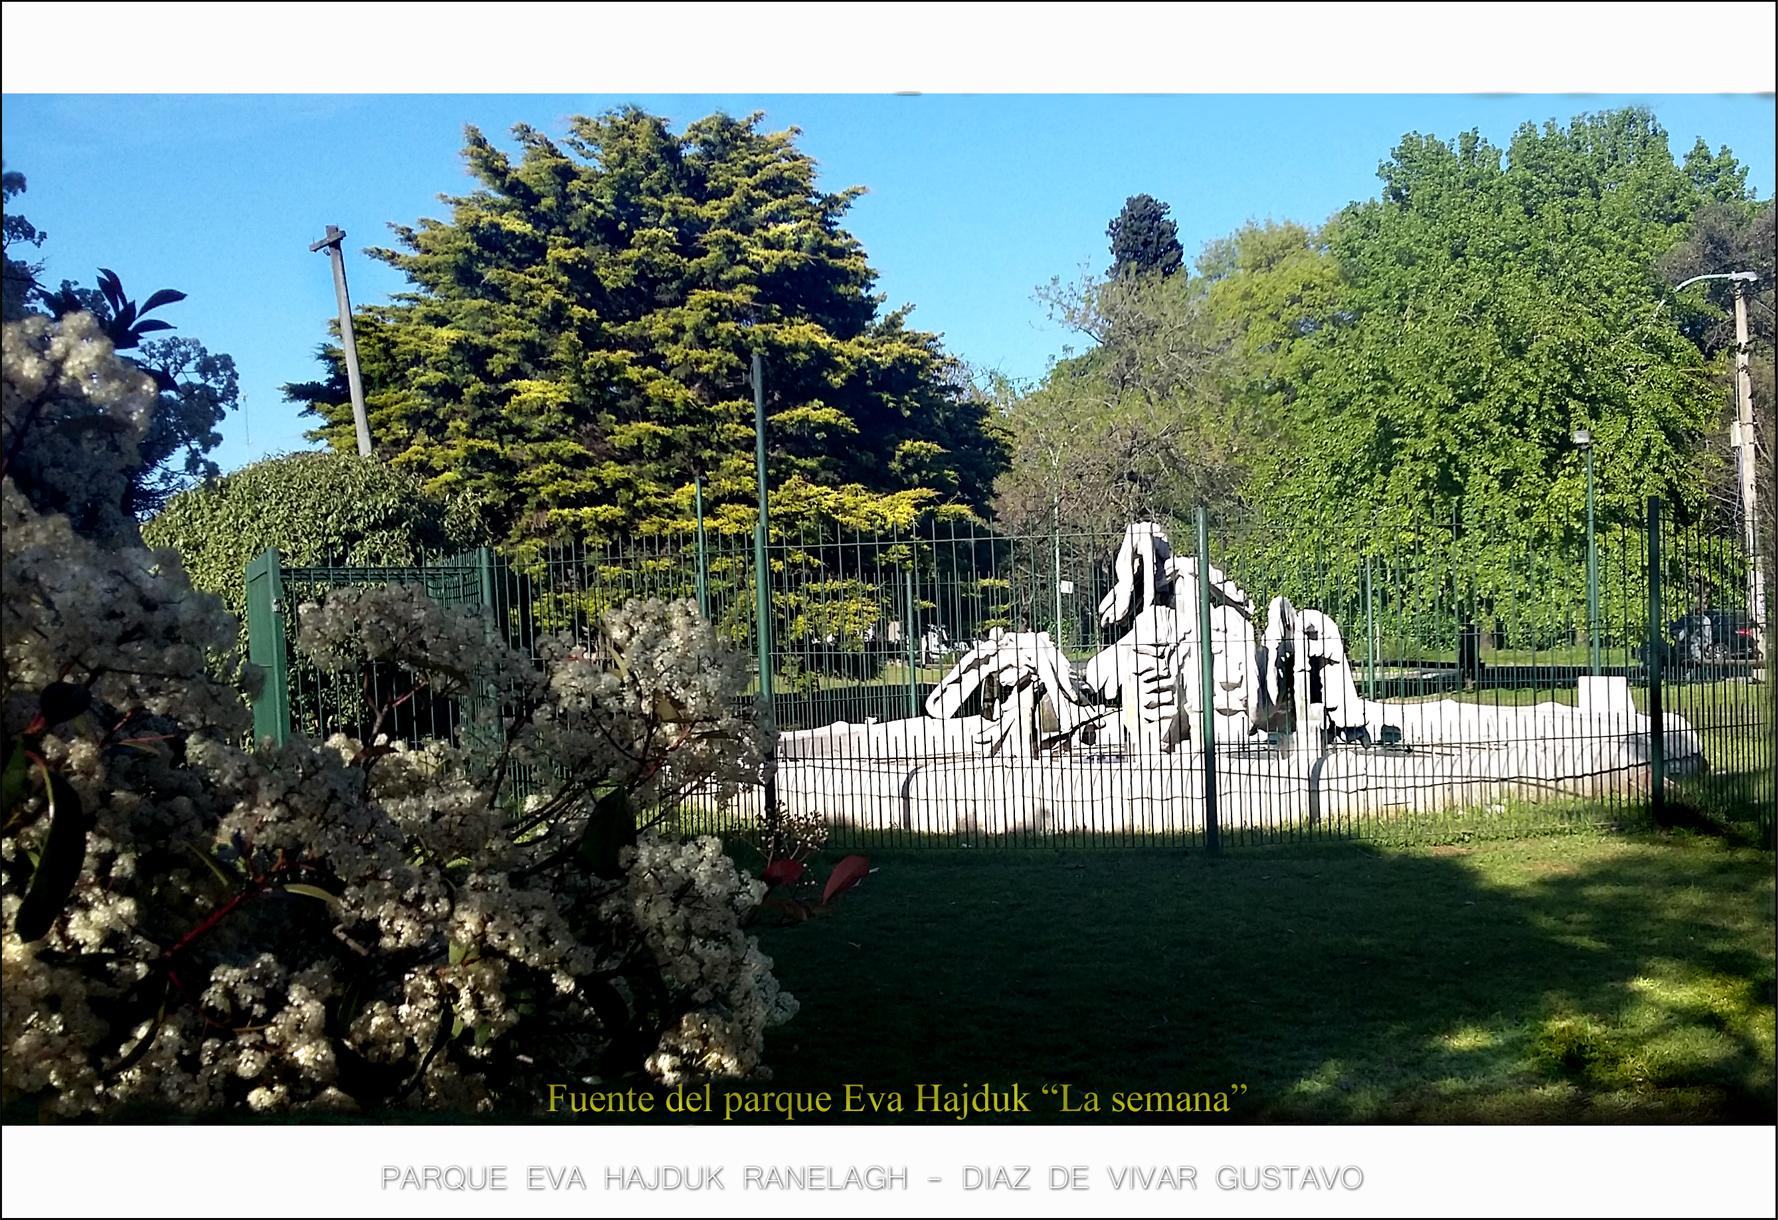 Fuente del parque Eva Hajduk la semana medio - Diaz De Vivar Gustavo